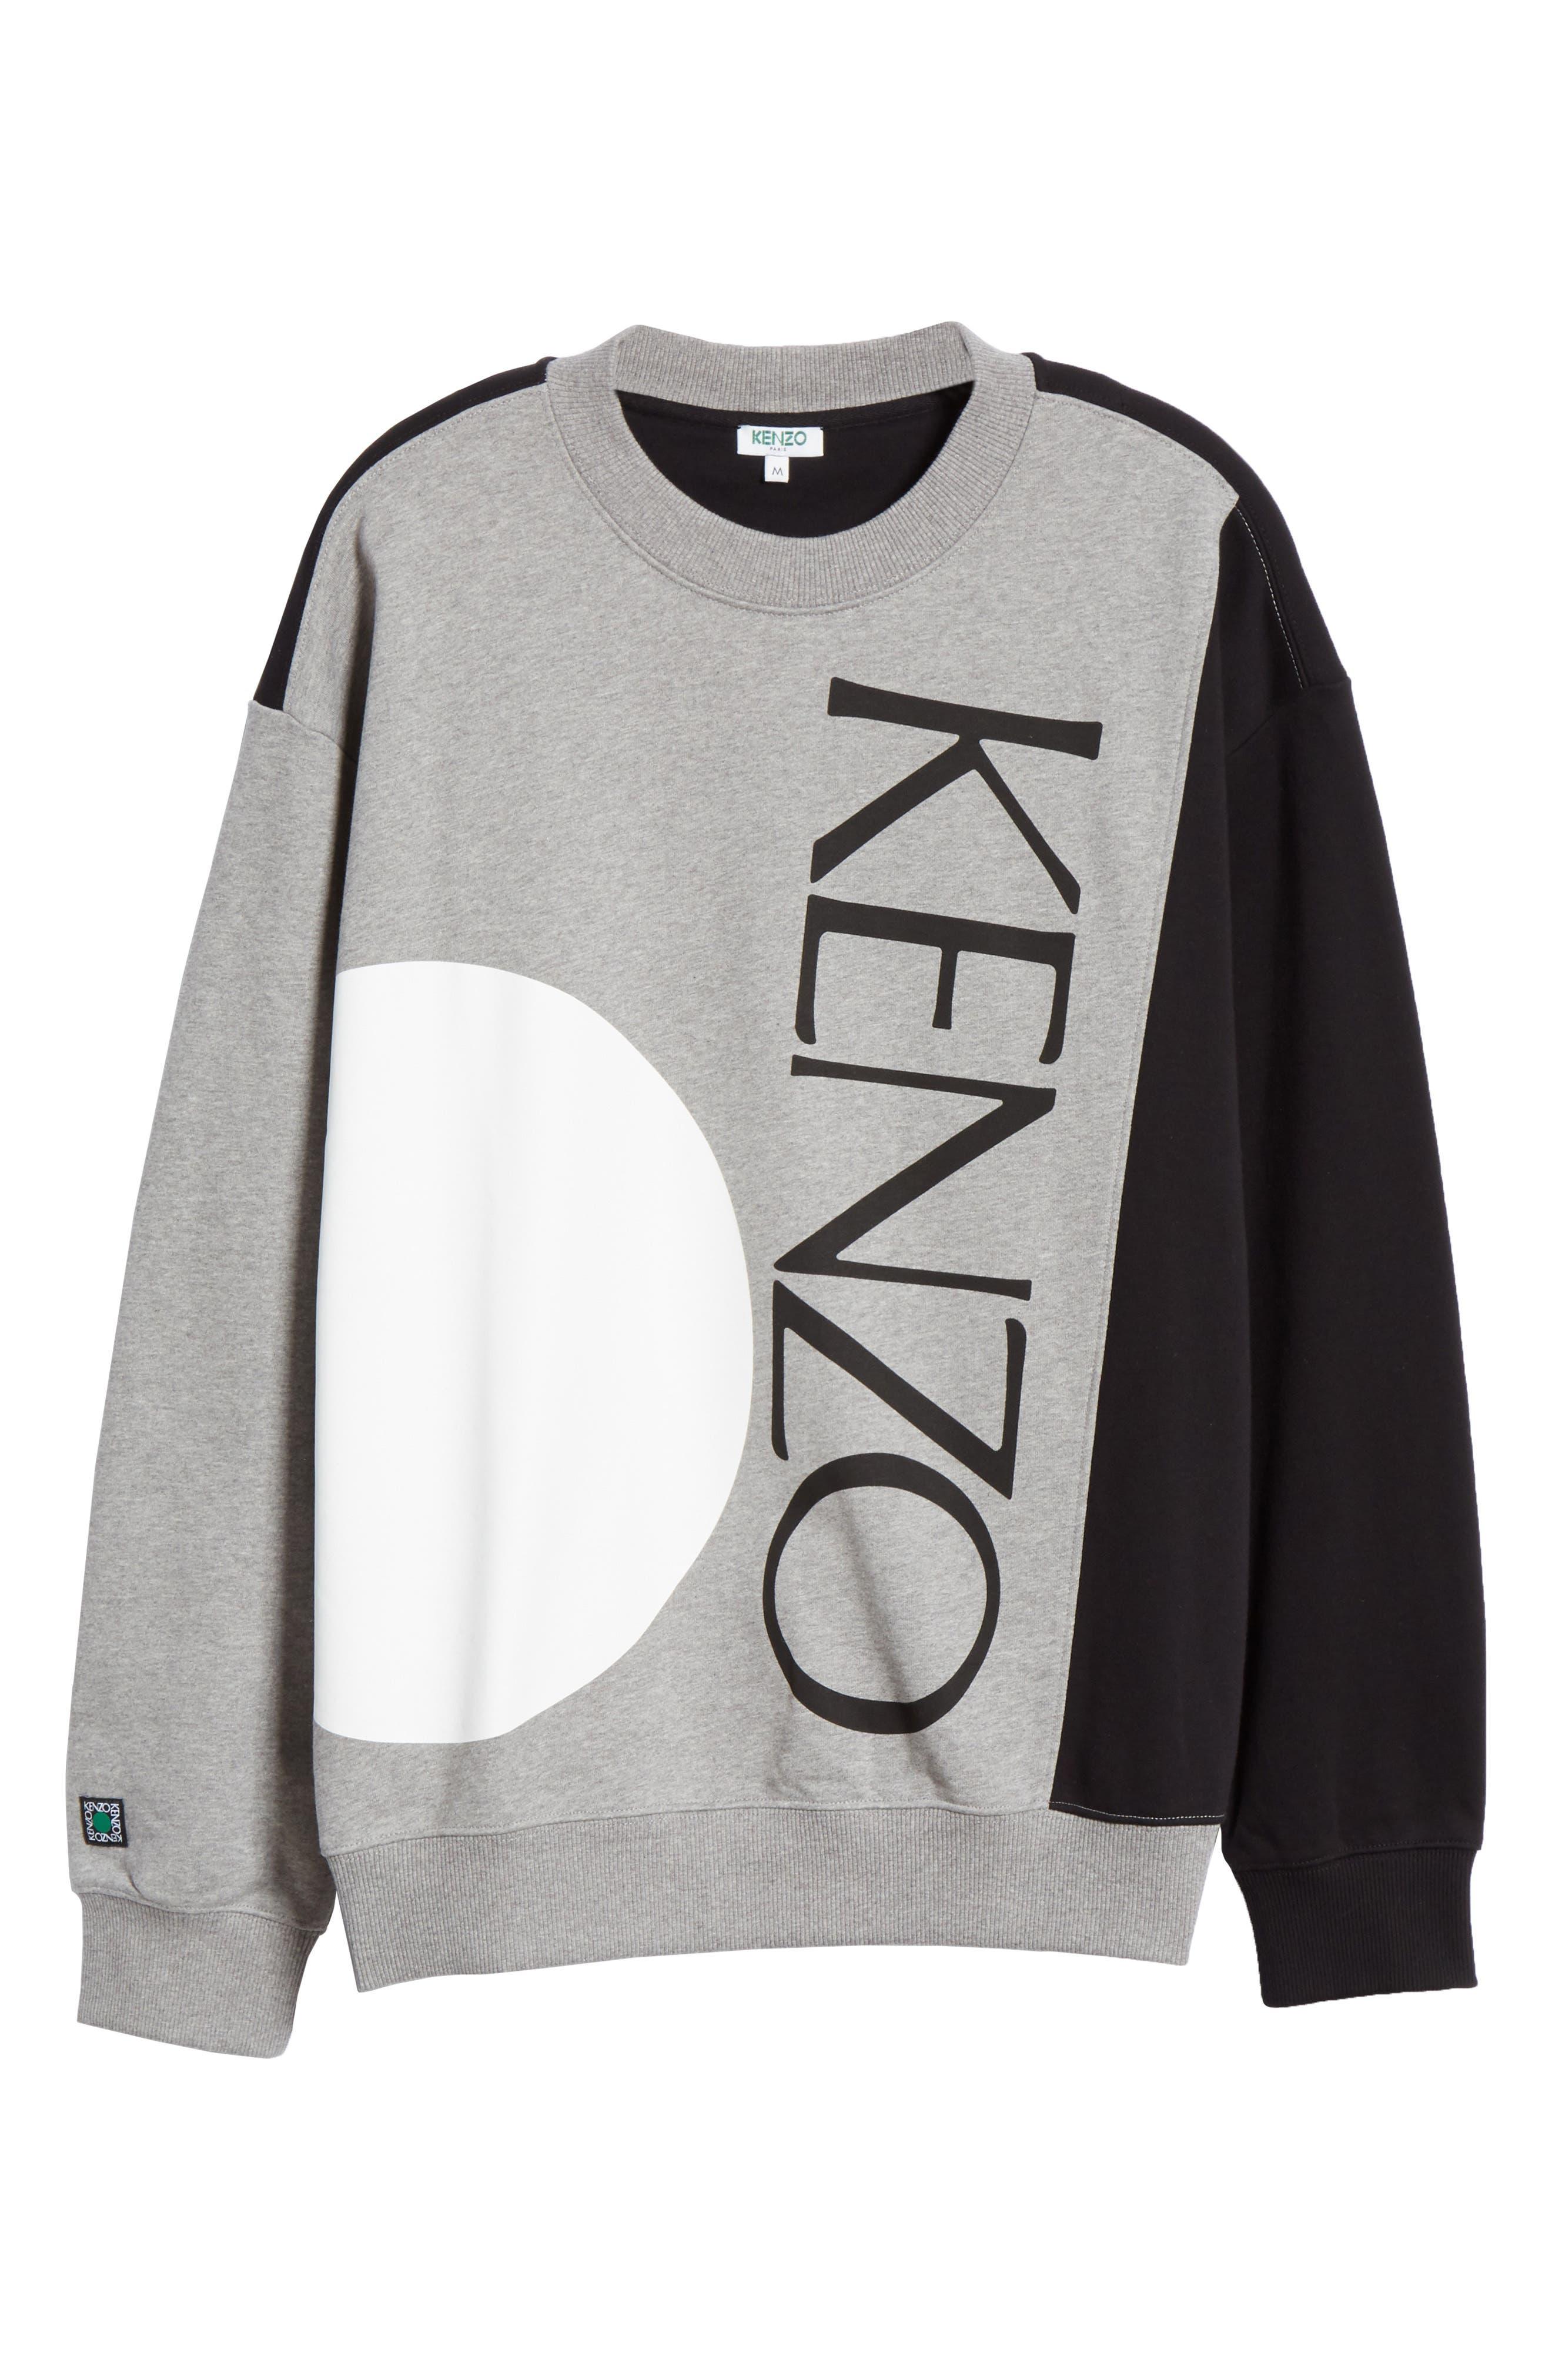 KENZO, Oversize Colorblock Sweatshirt, Alternate thumbnail 6, color, DOVE GREY